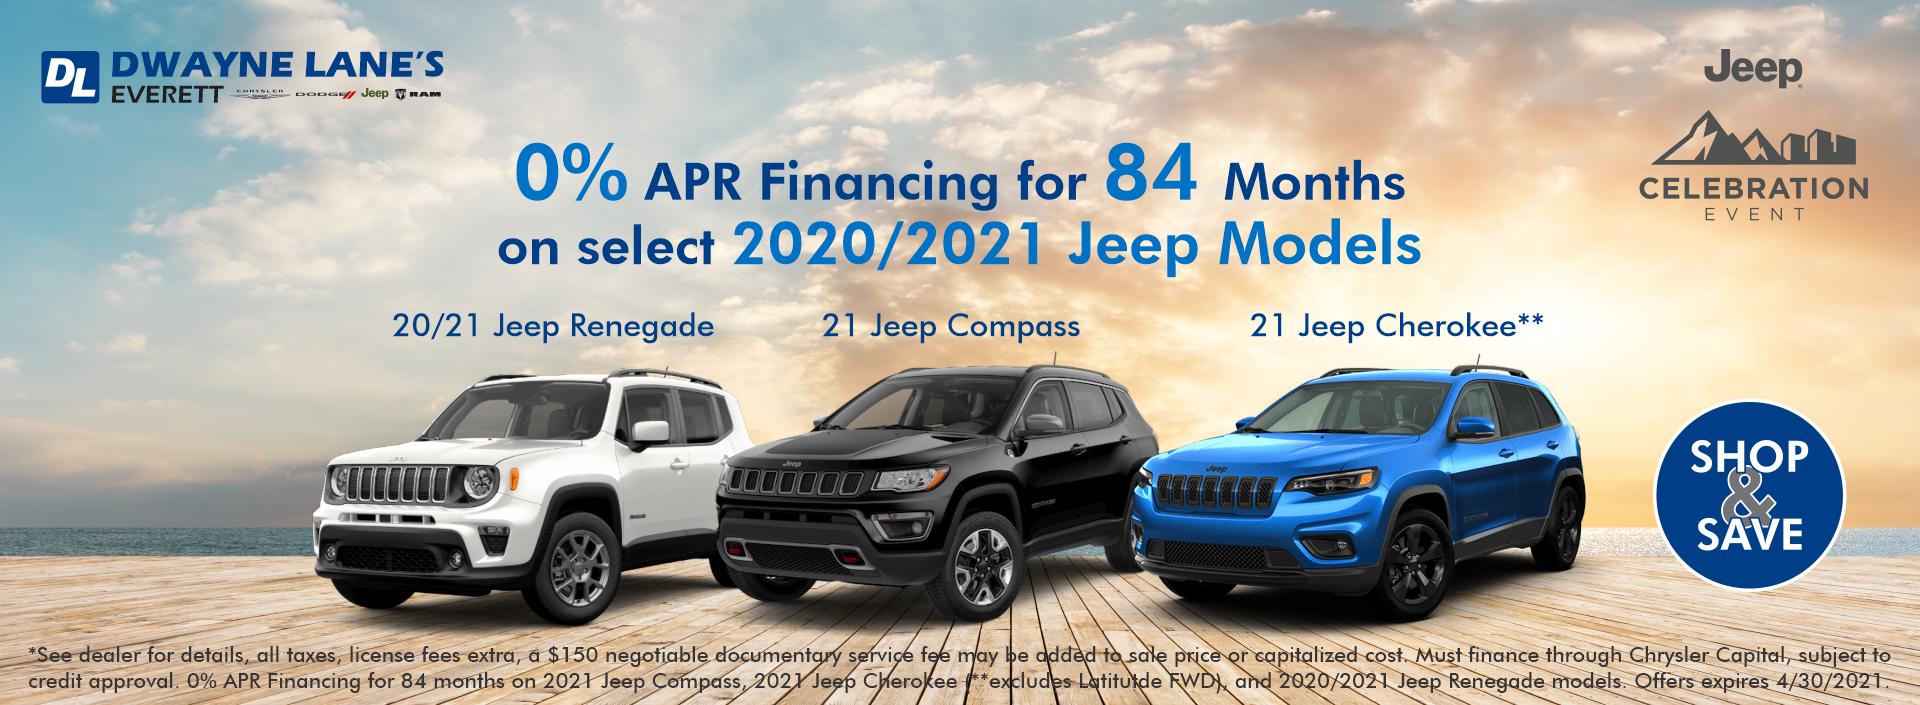 2021AprilBanners-DLAF-Jeep